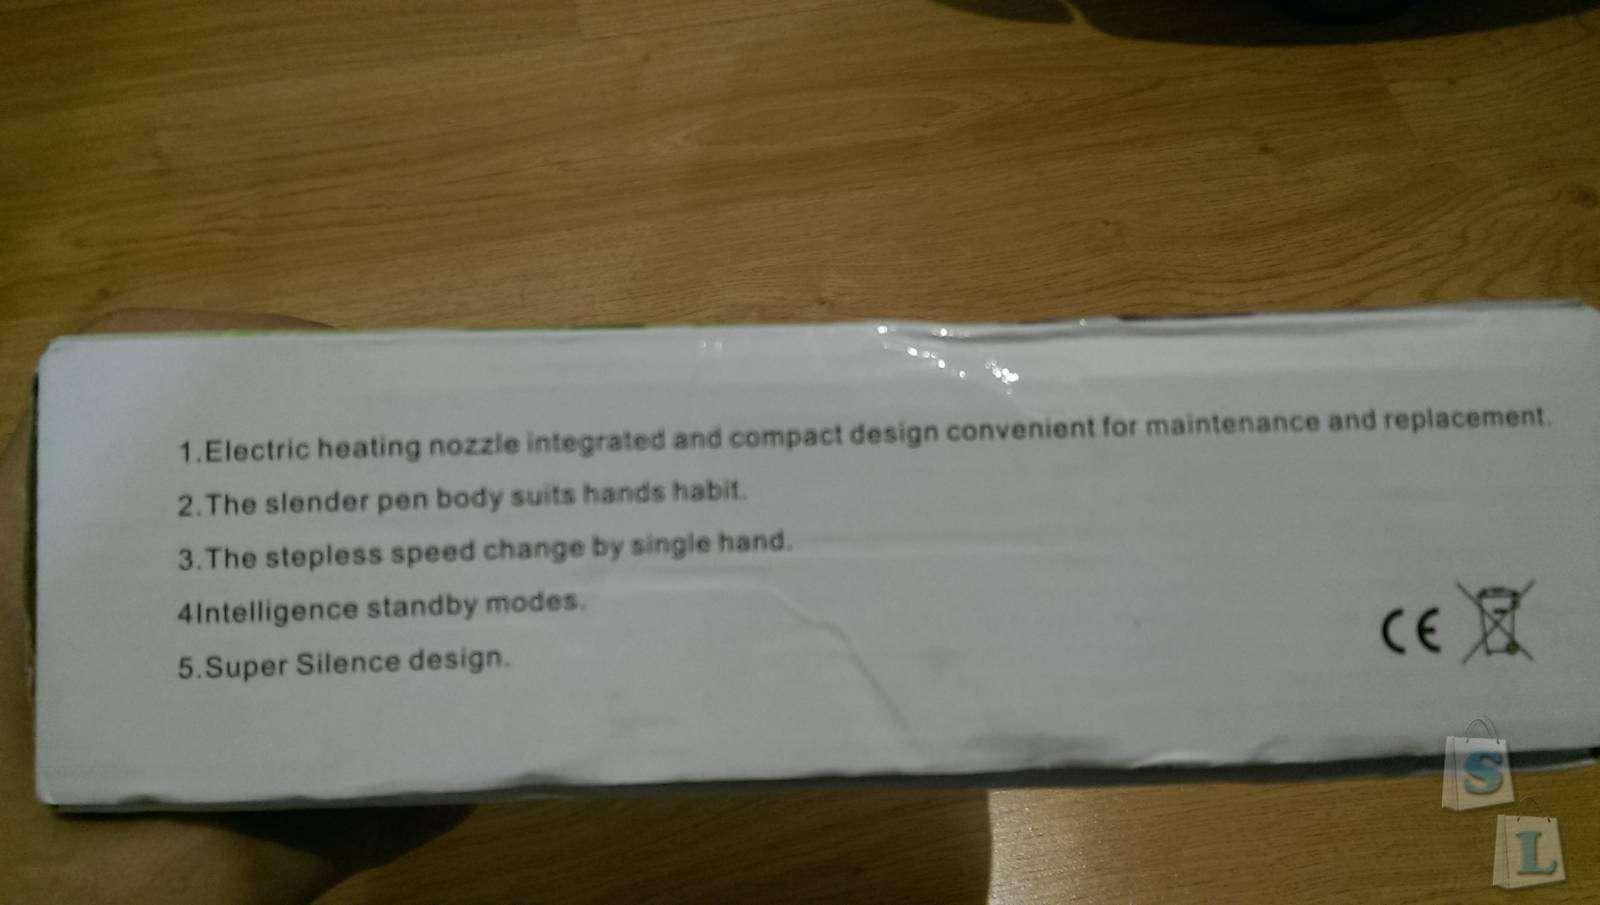 GearBest: 3D ручка для детской ручки :-)